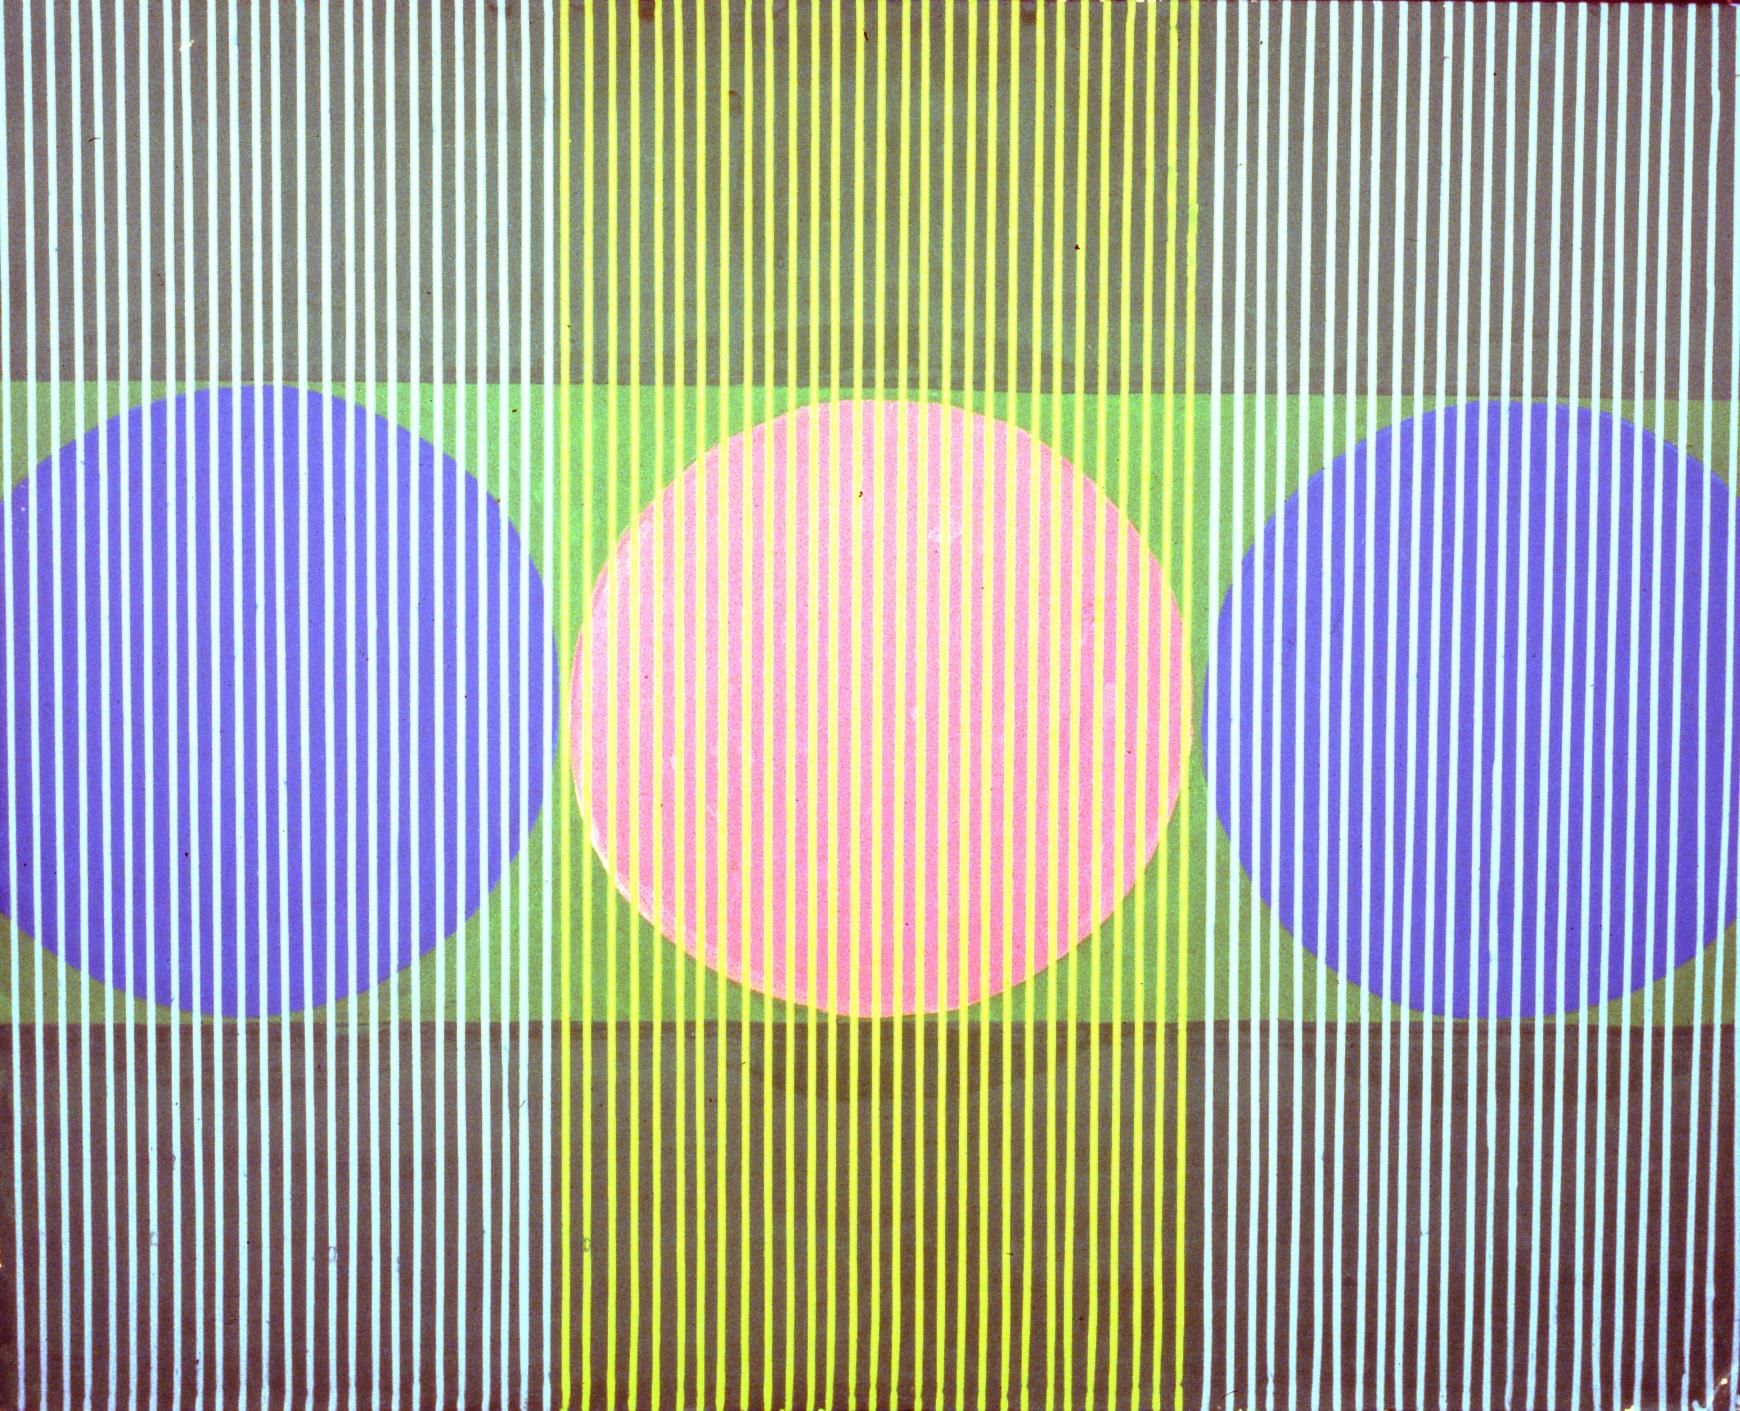 Untitled , 1962, Richard Touman, oil on board, 1996.07.01